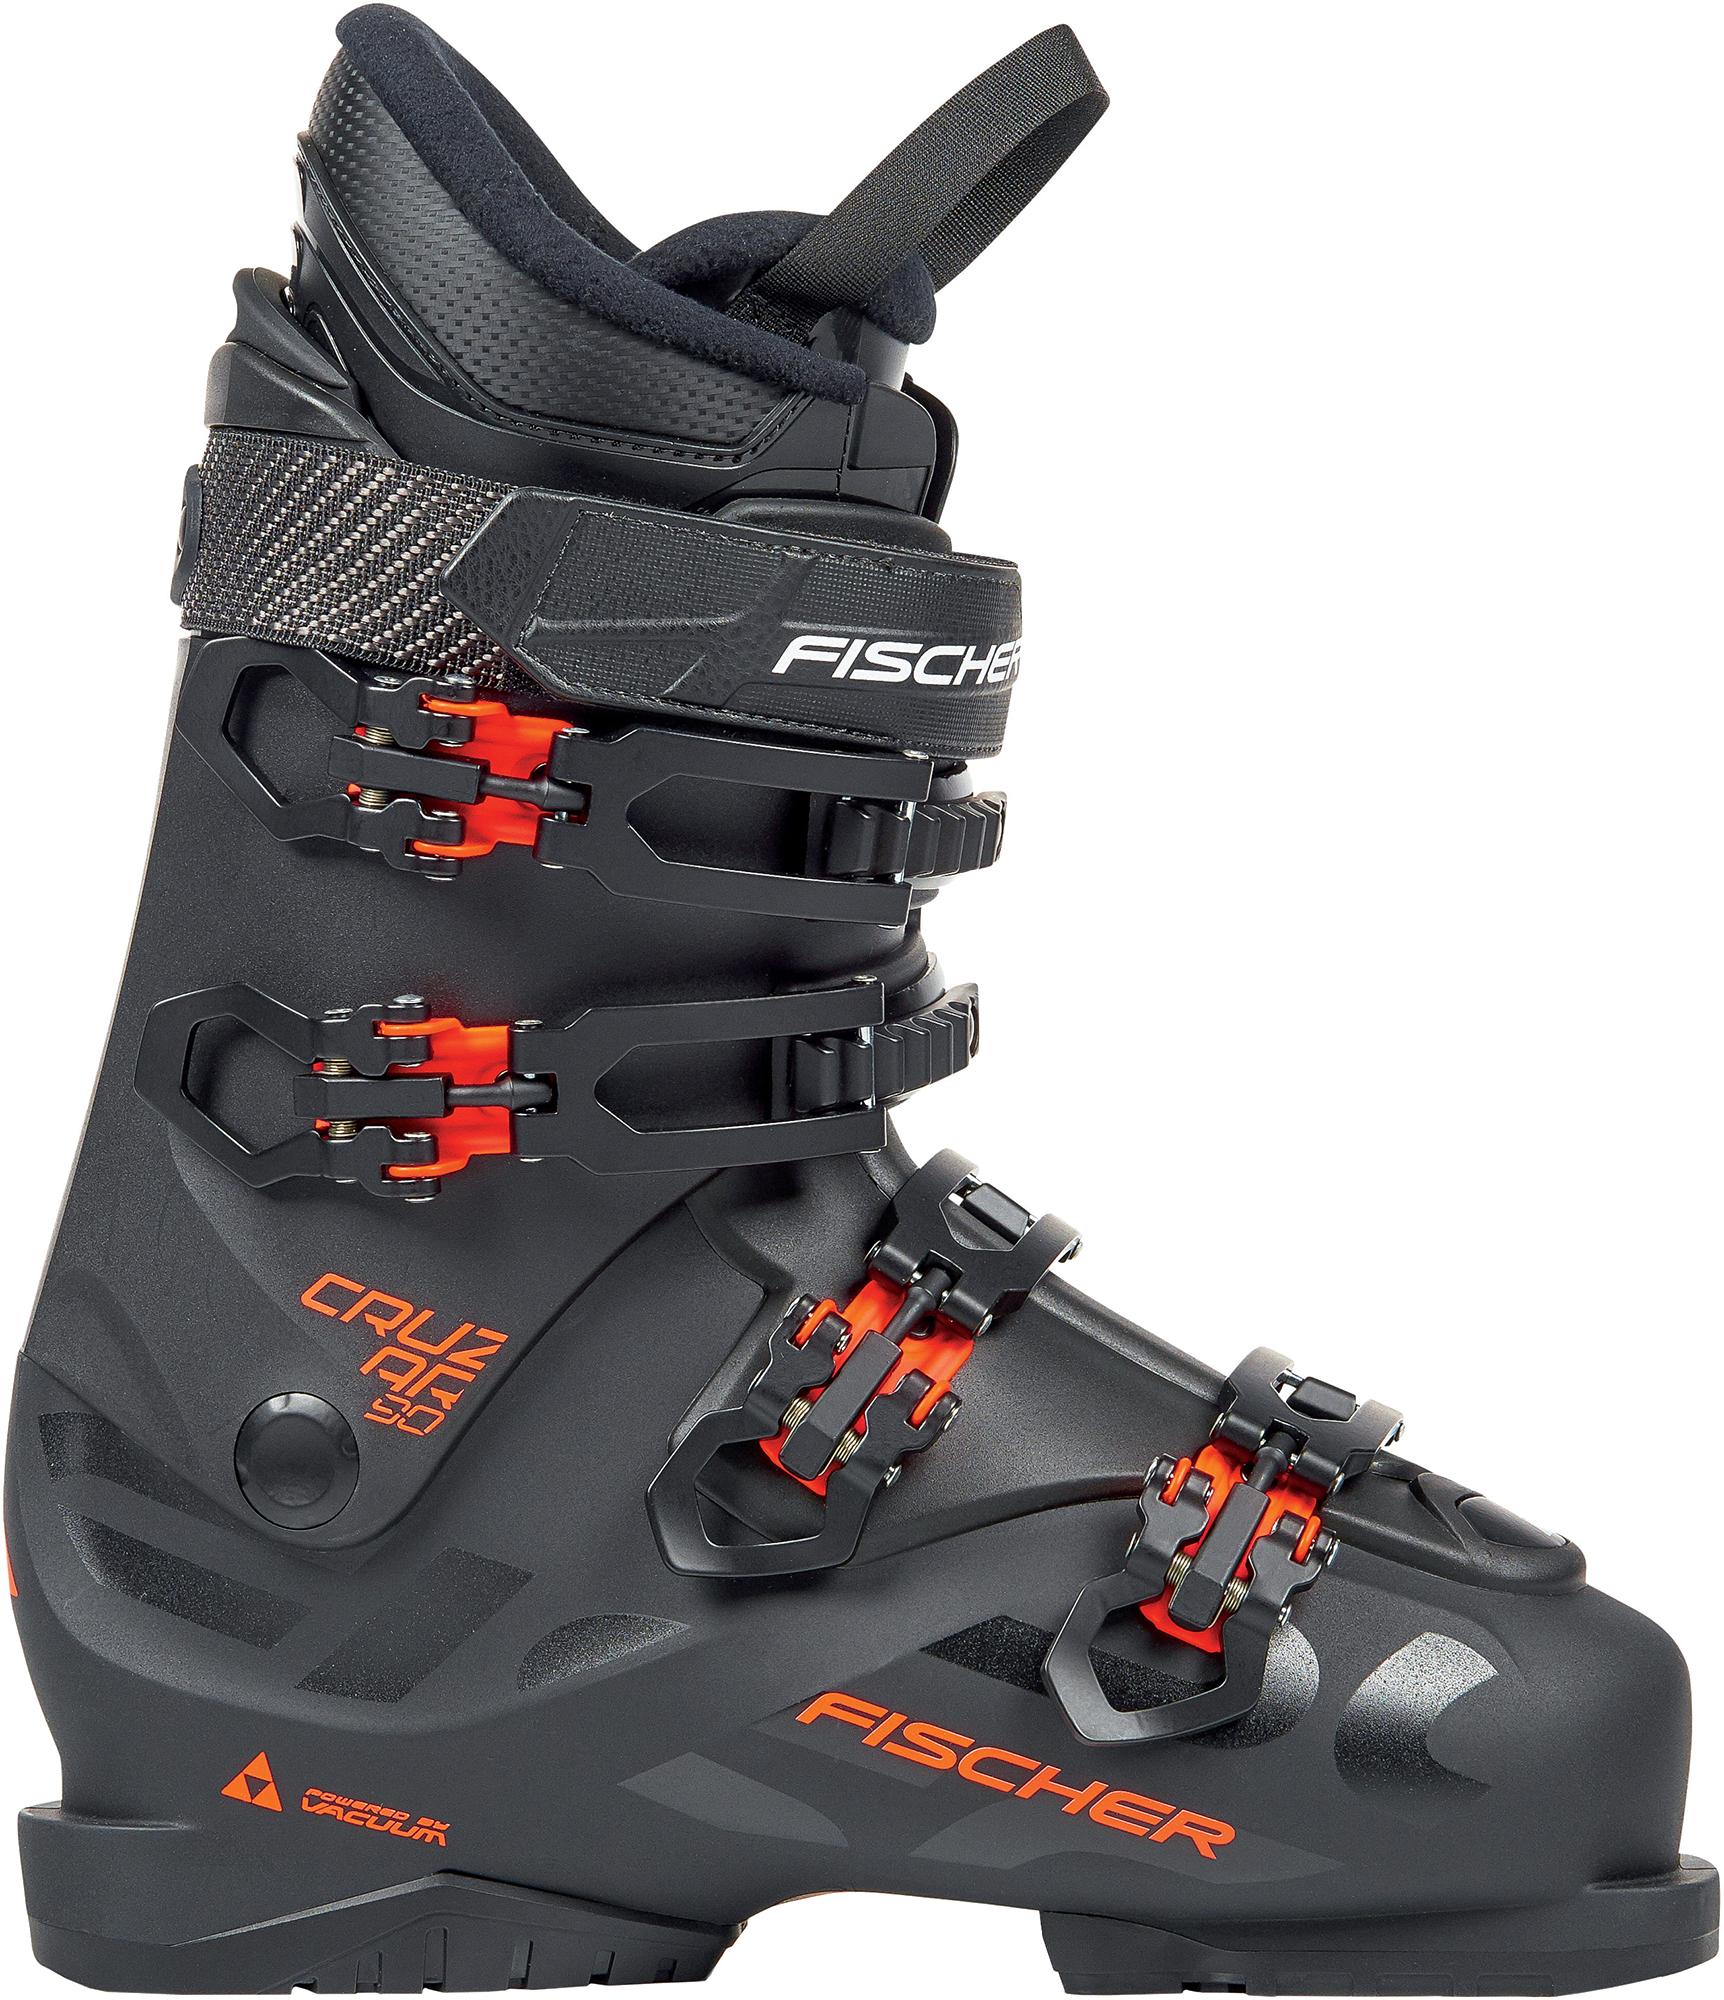 Fischer Ботинки горнолыжные Cruzar 90 Pbv, размер 30,5 см